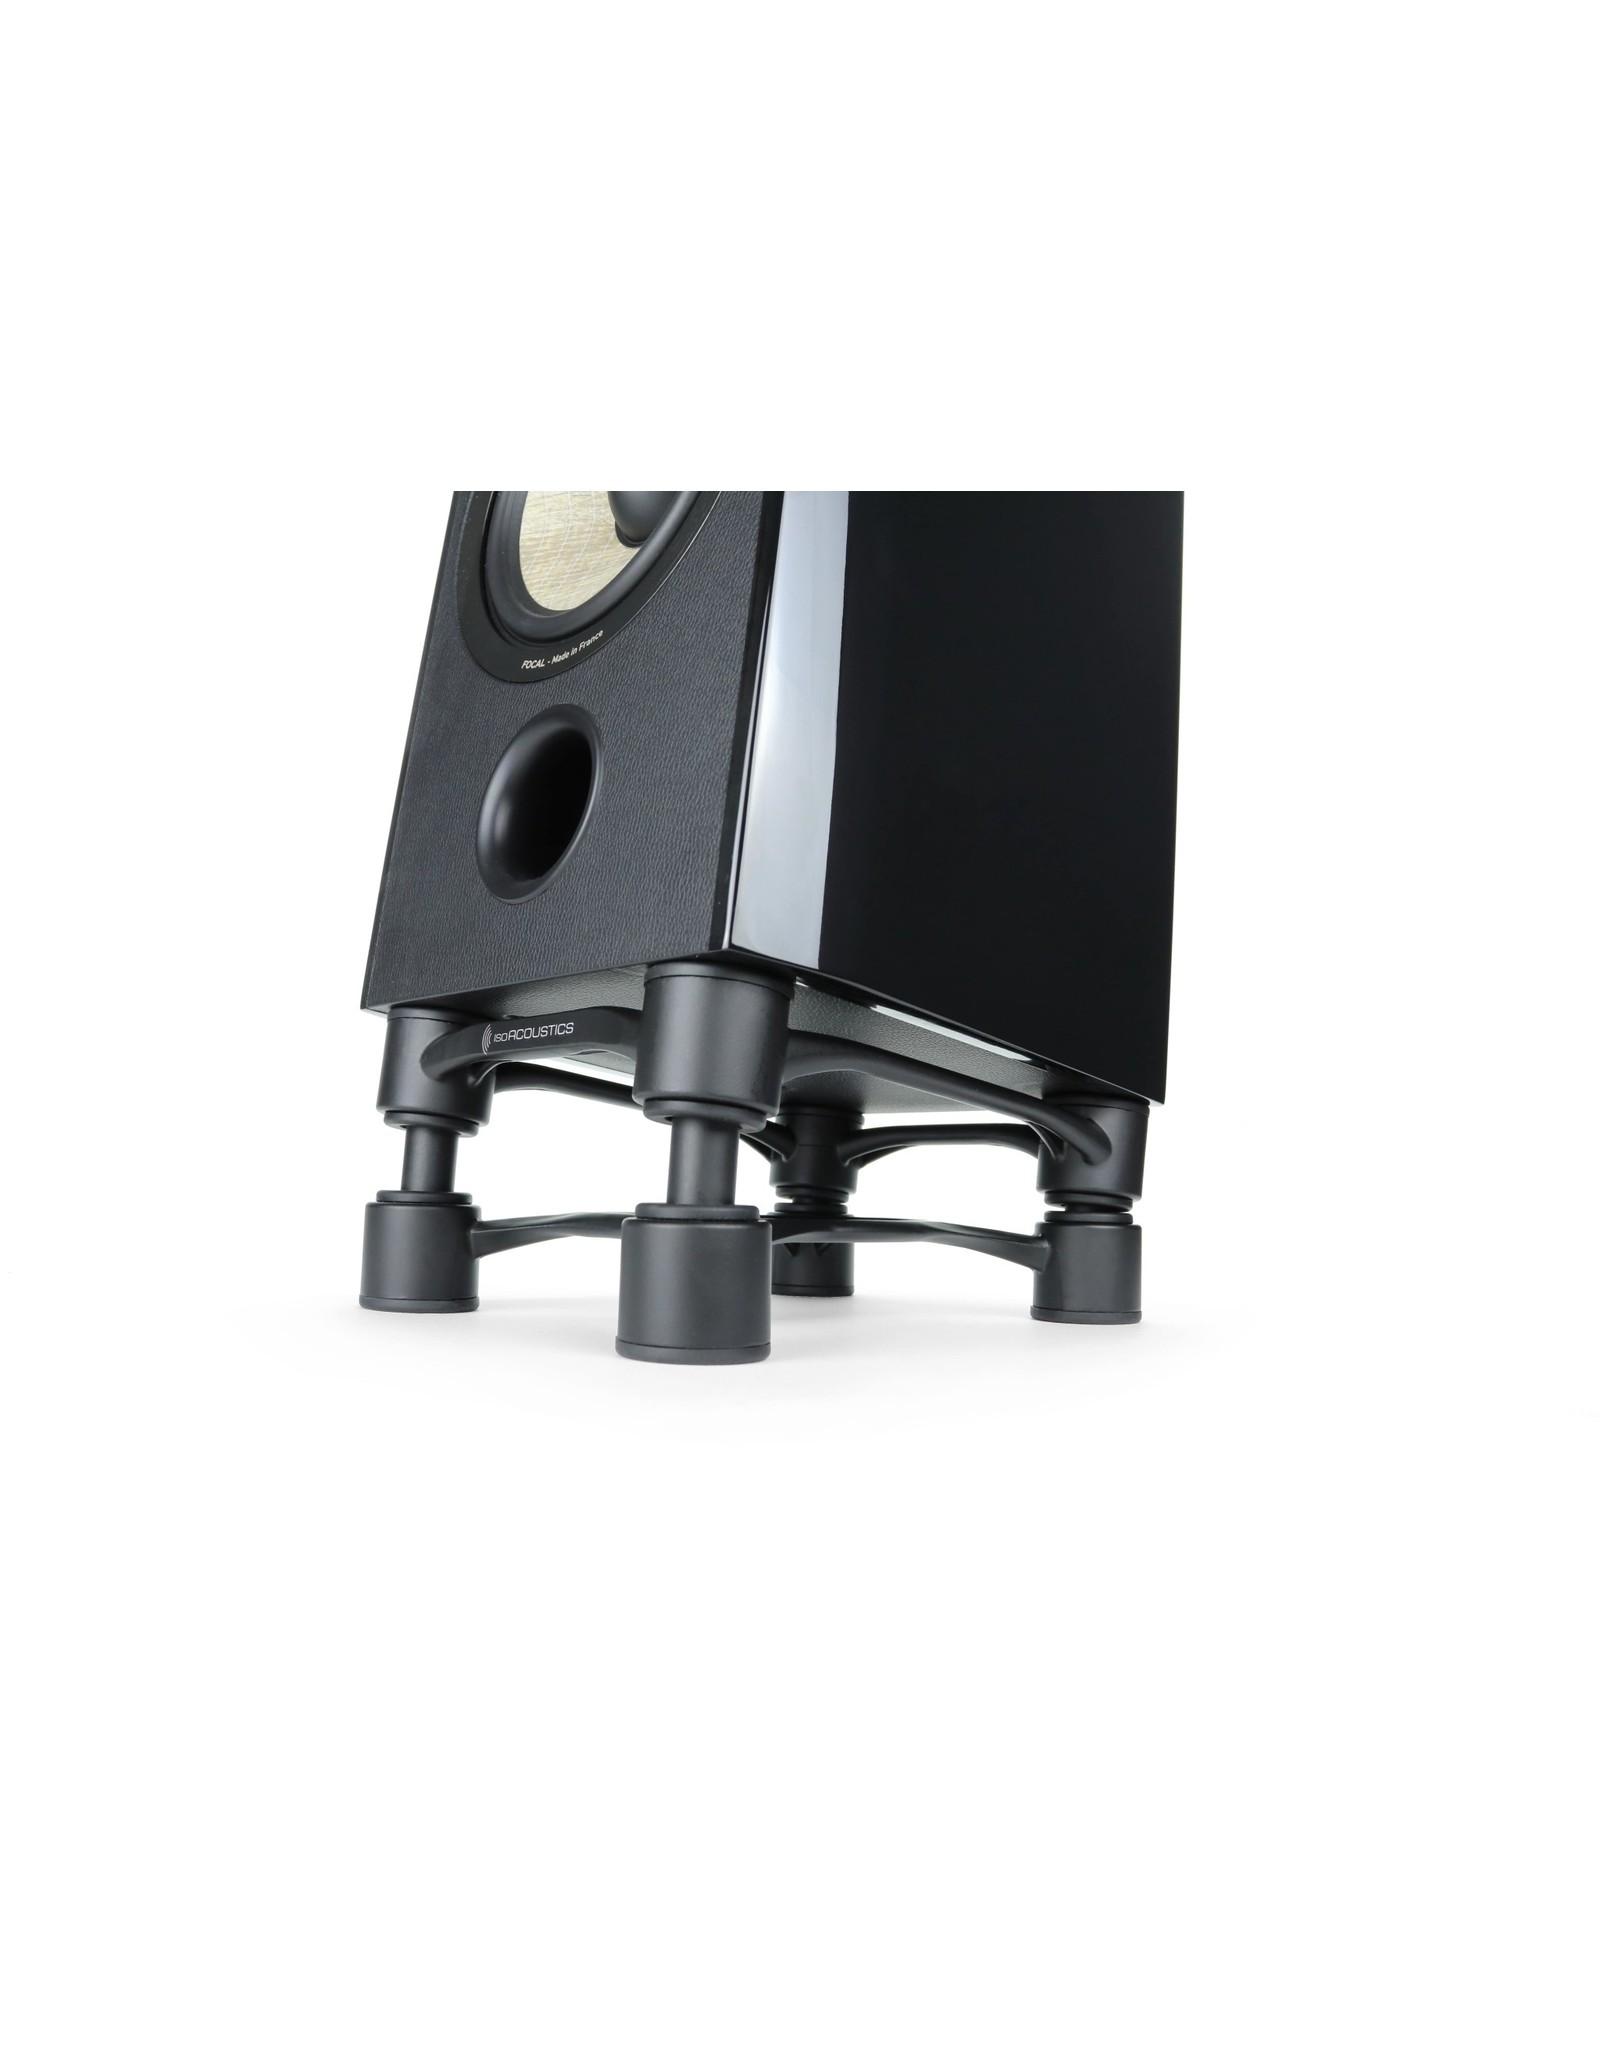 IsoAcoustics IsoAcoustics Aperta 200 Isolation Speaker Stands